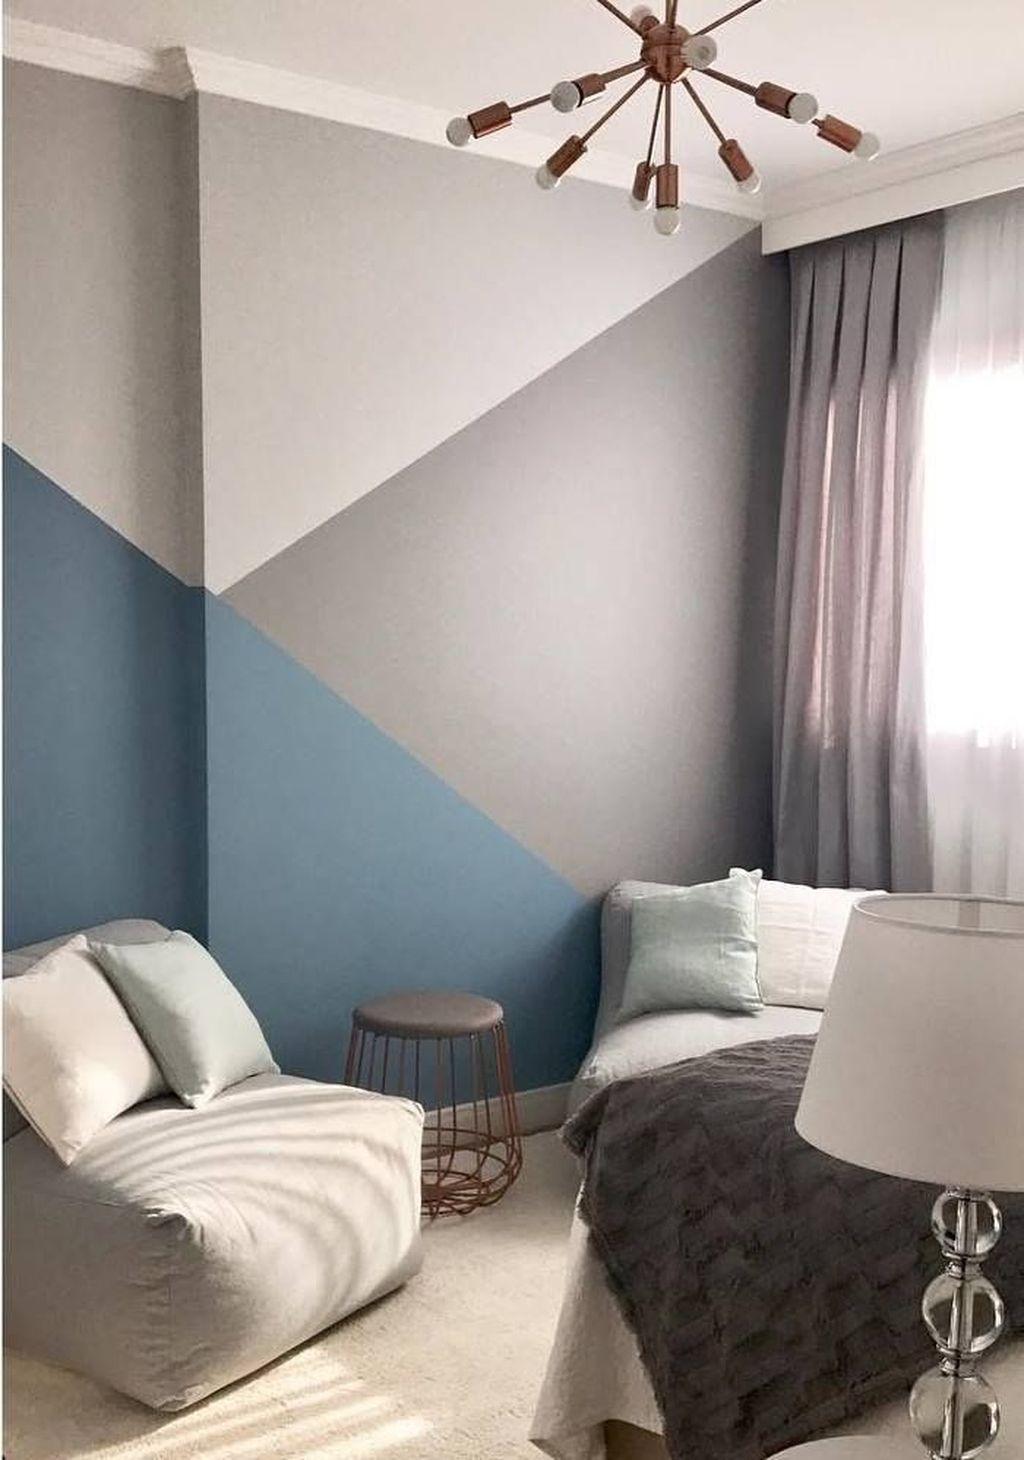 39 Newest Paint Home Decor Ideas That Trending Now Wall Trends Bedroom Wall Paint Bedroom Wall